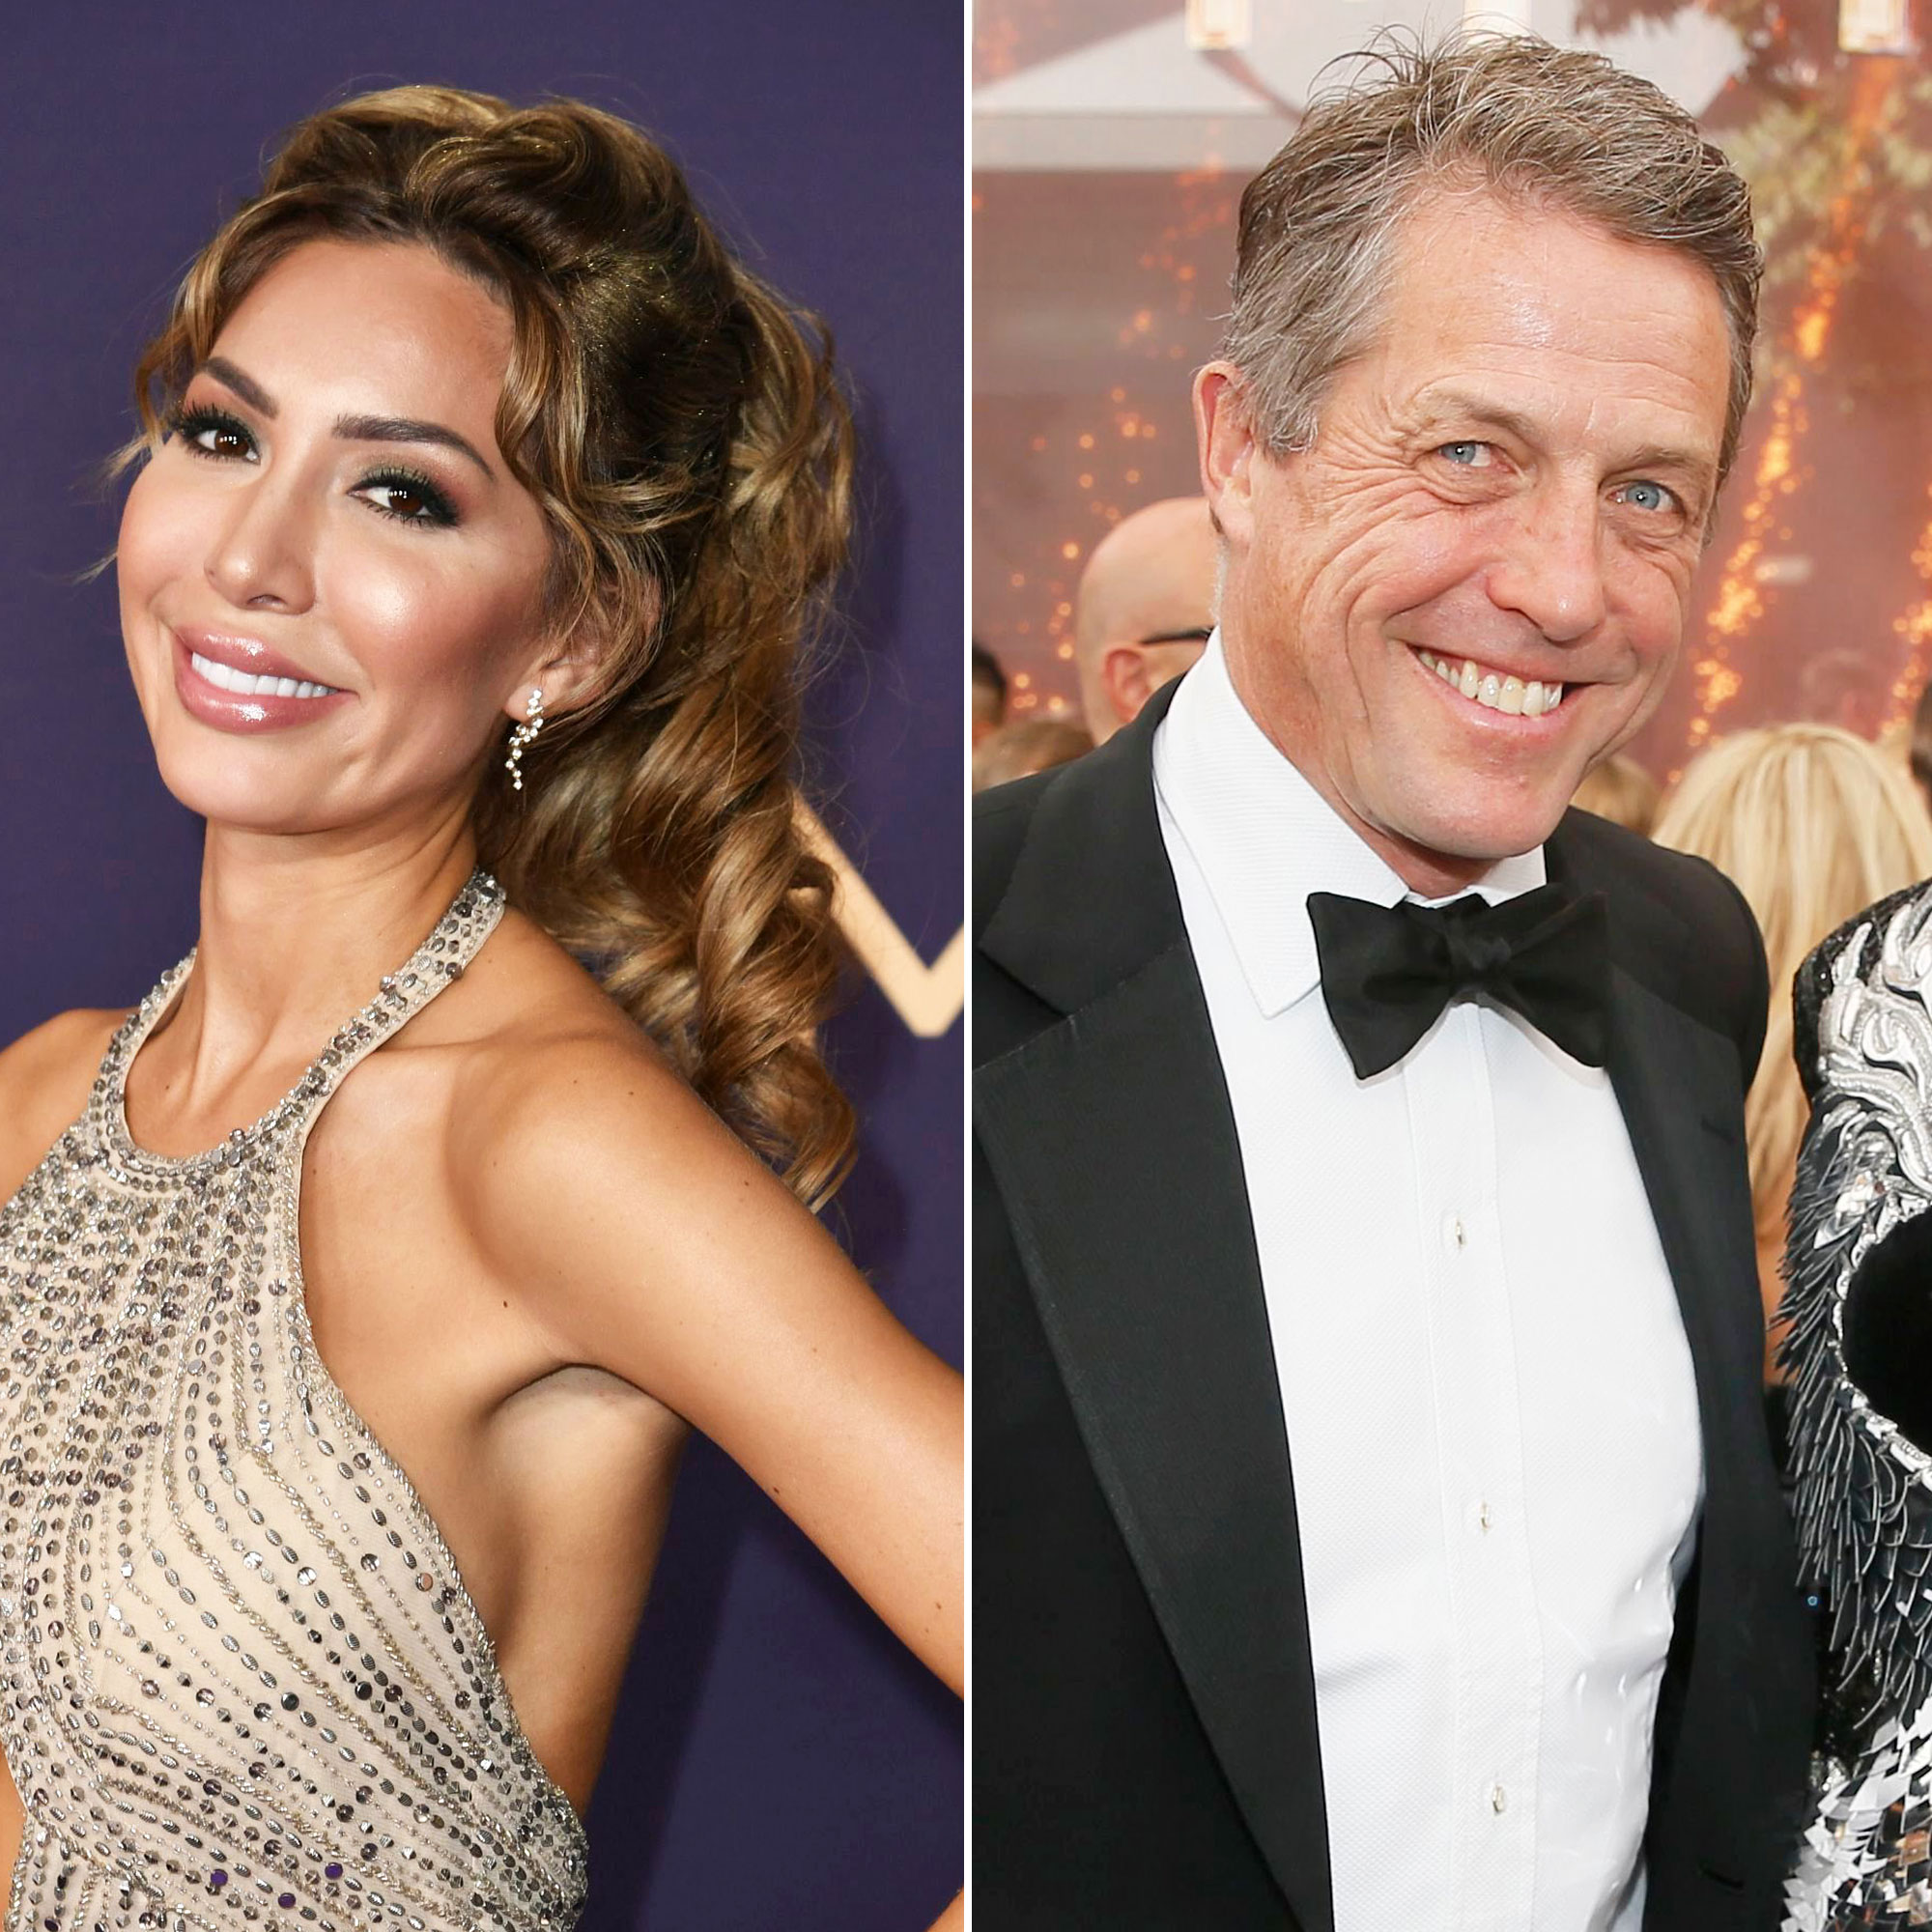 Farrah Abraham Sat Next to Hugh Grant at the 2019 Emmy Awards